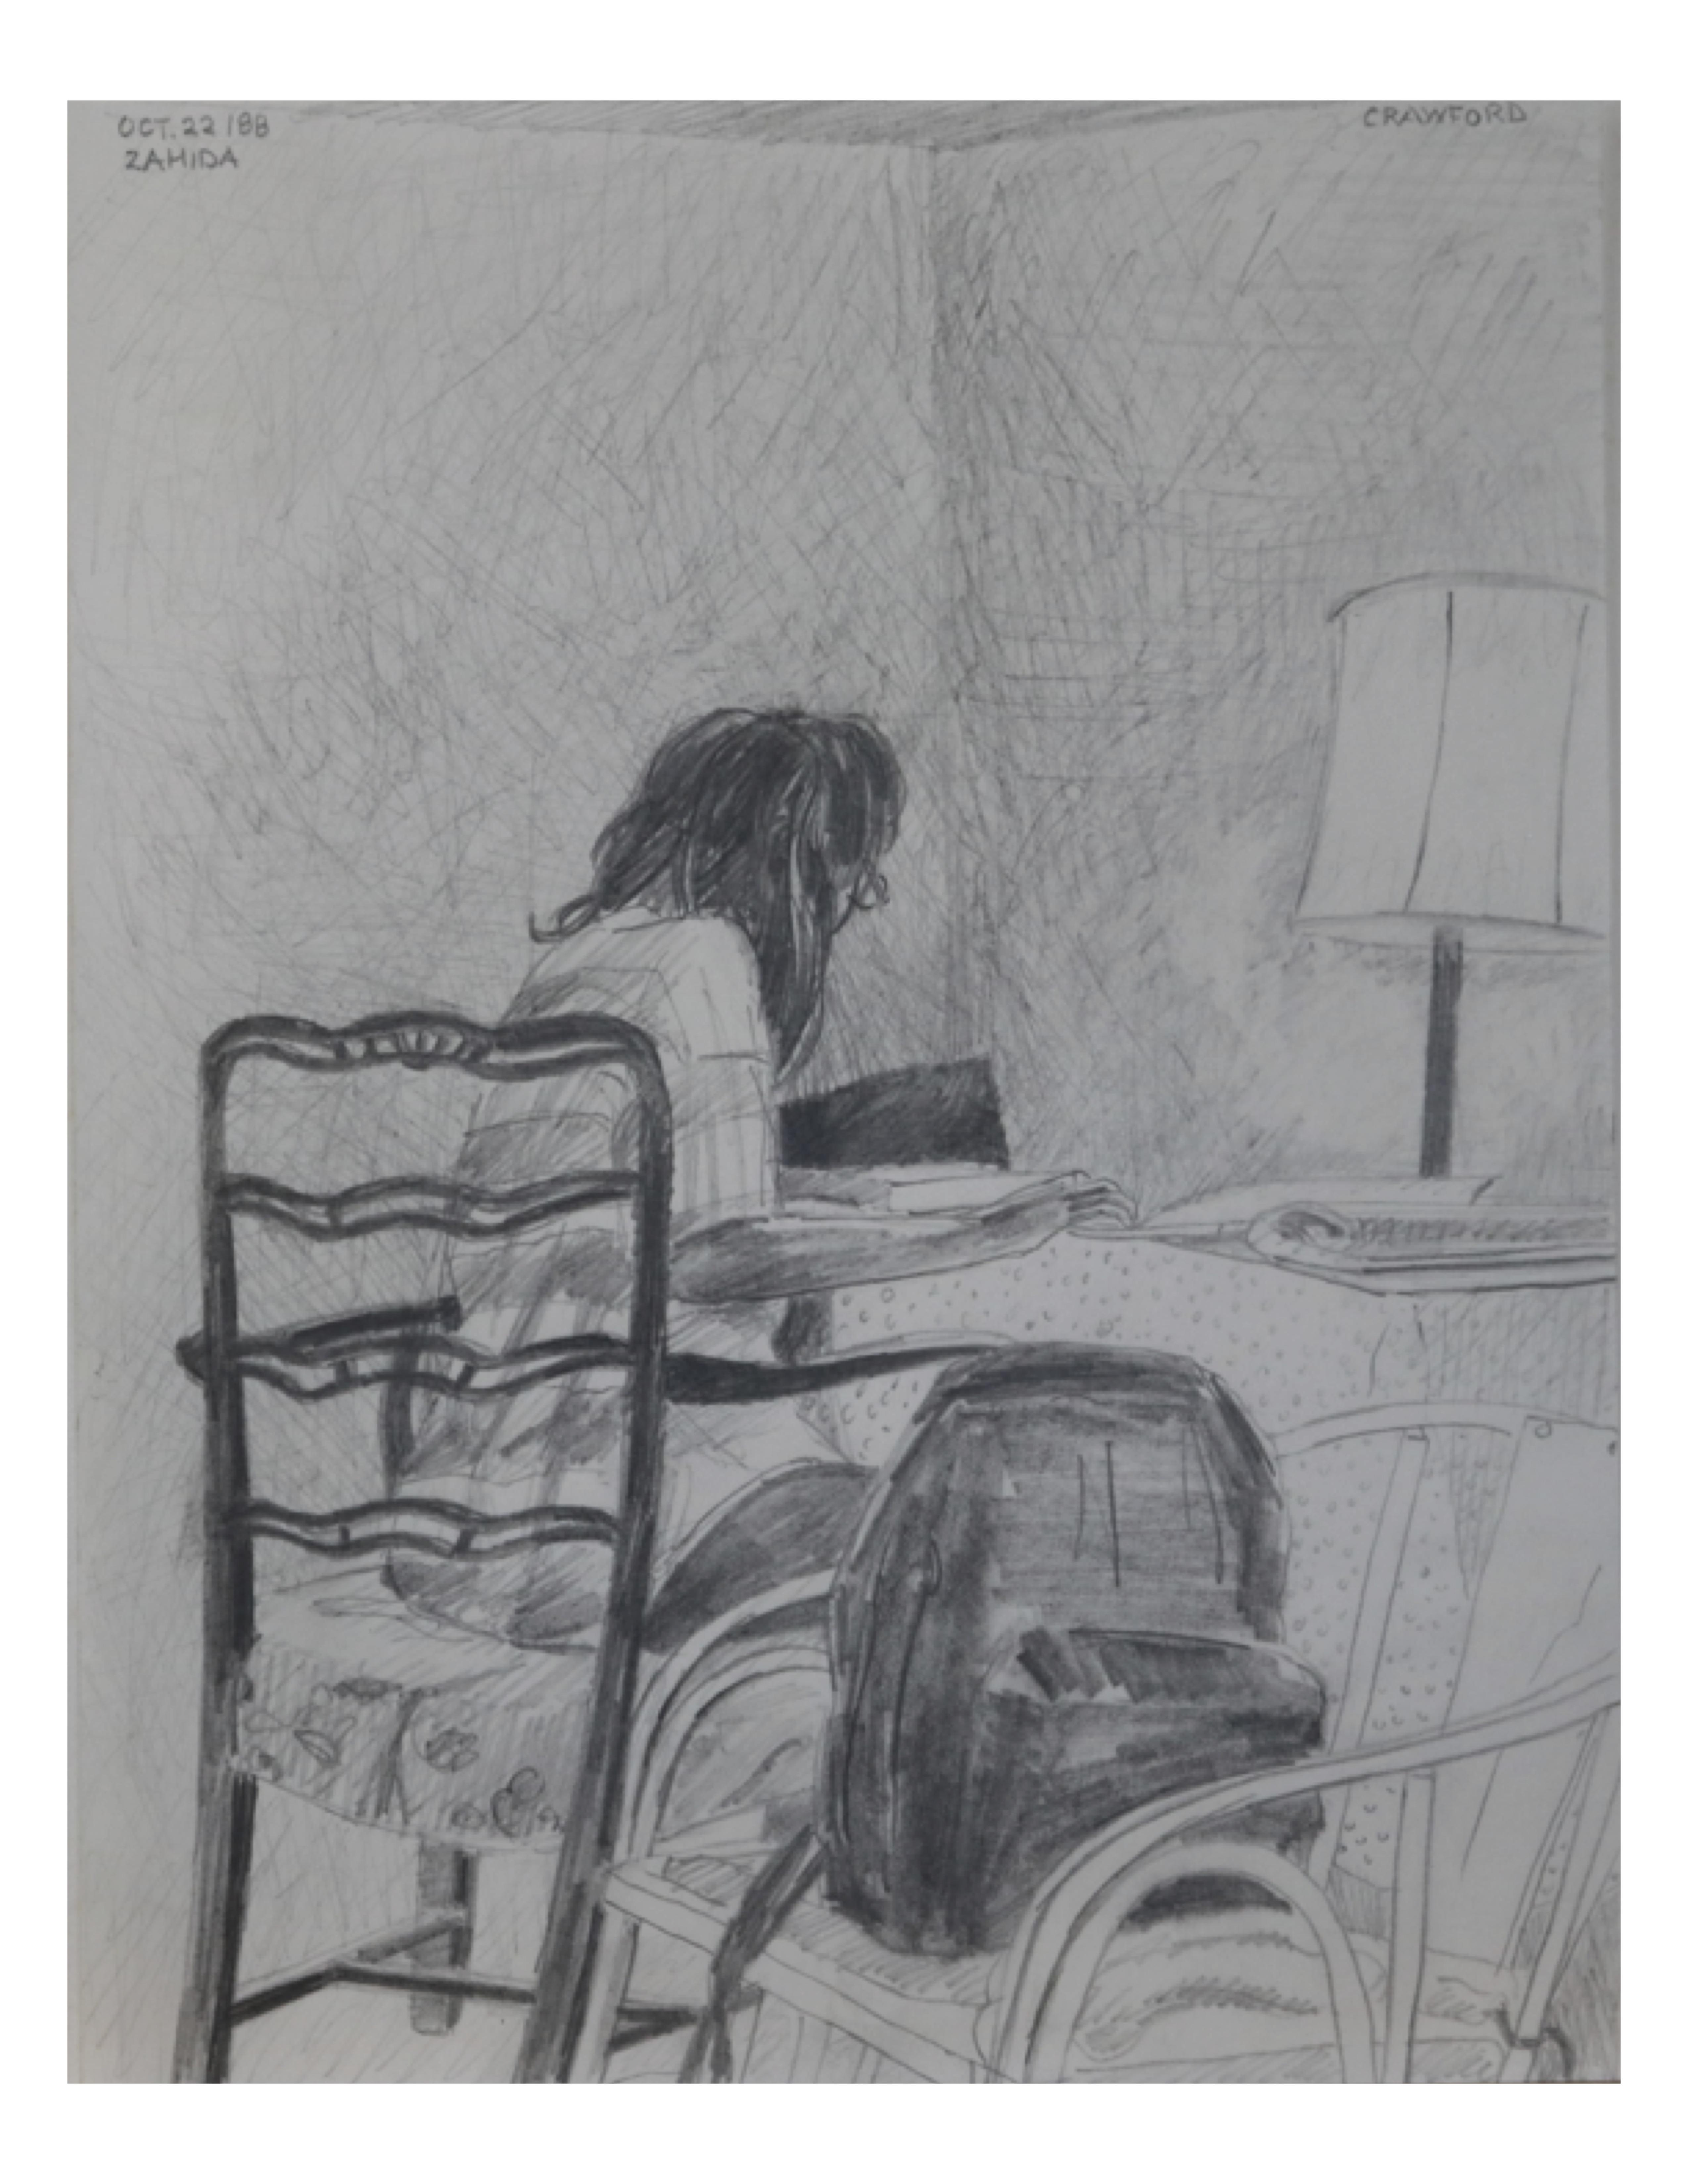 Zahida reading, Oct 22, 1988, pencil on paper, 21.6 cm x 28 cm